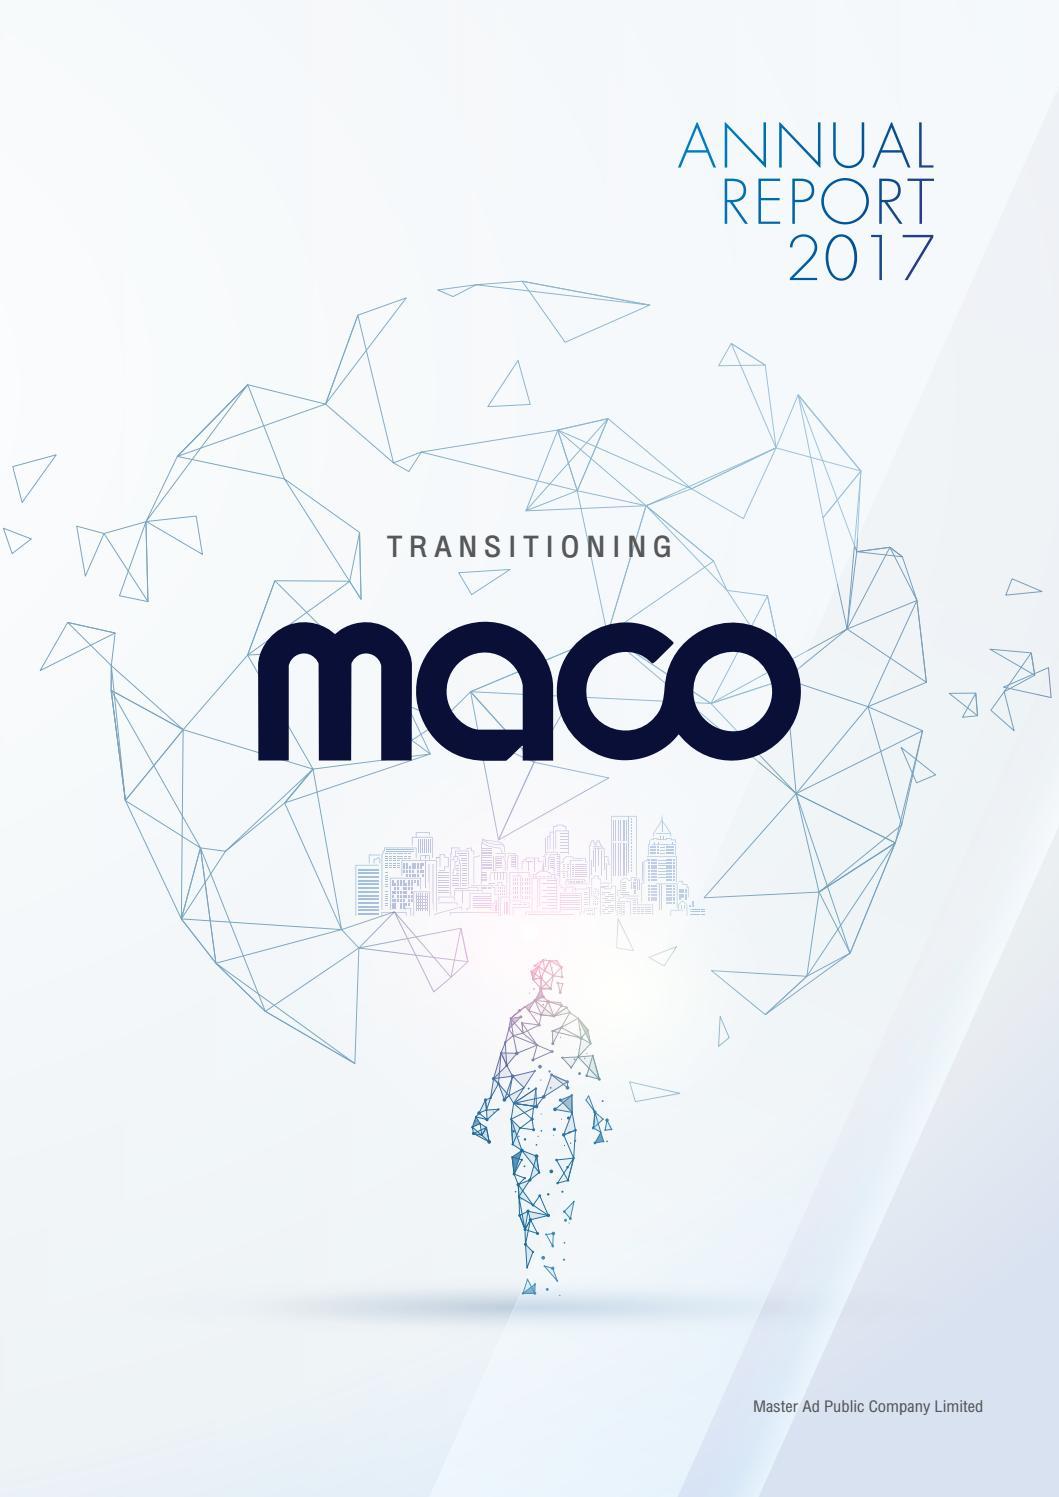 Maco Annual Report 2017 By Piyanat Kimhamanon Issuu